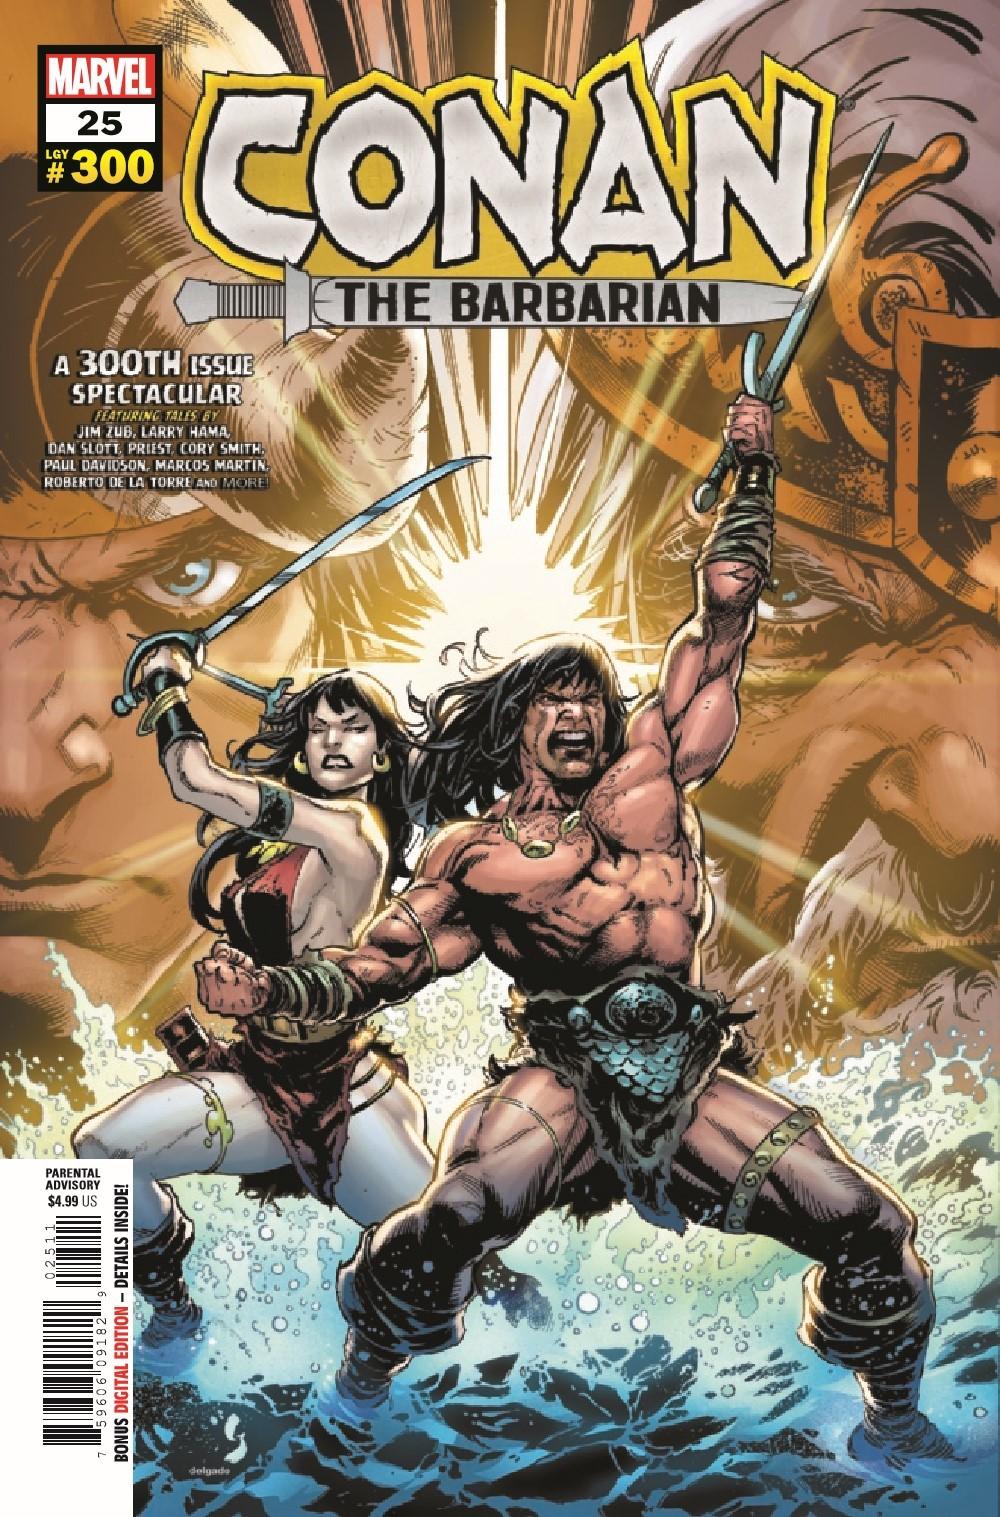 CONANBARB2019025_Preview-1 ComicList Previews: CONAN THE BARBARIAN #25